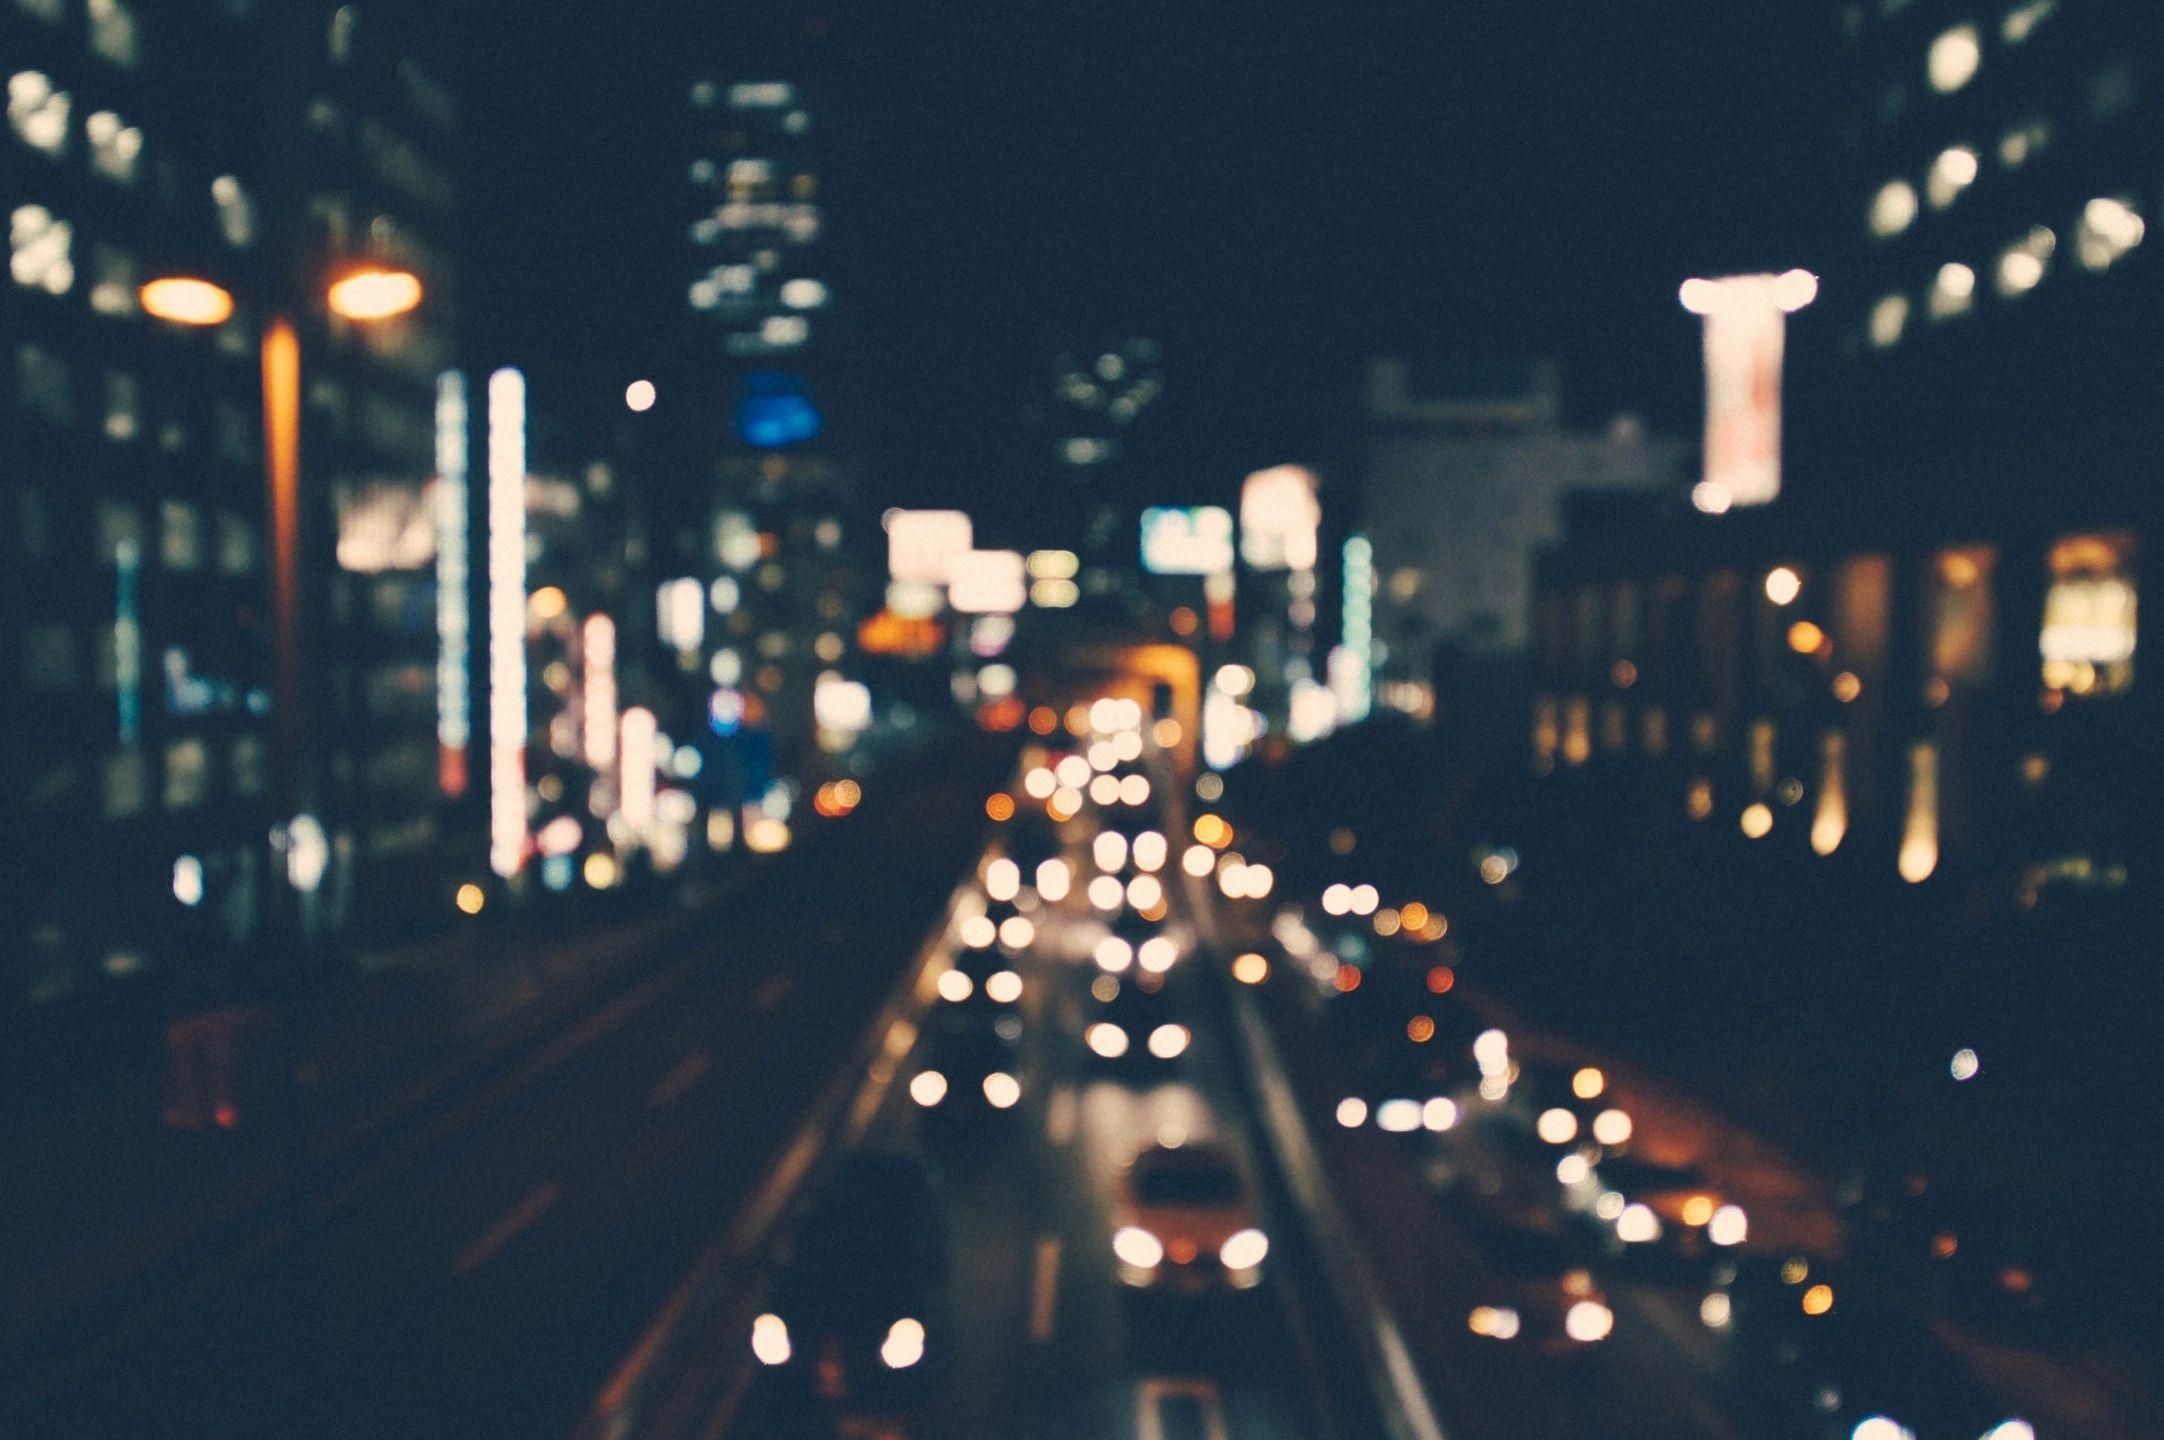 City Montage - winning the world